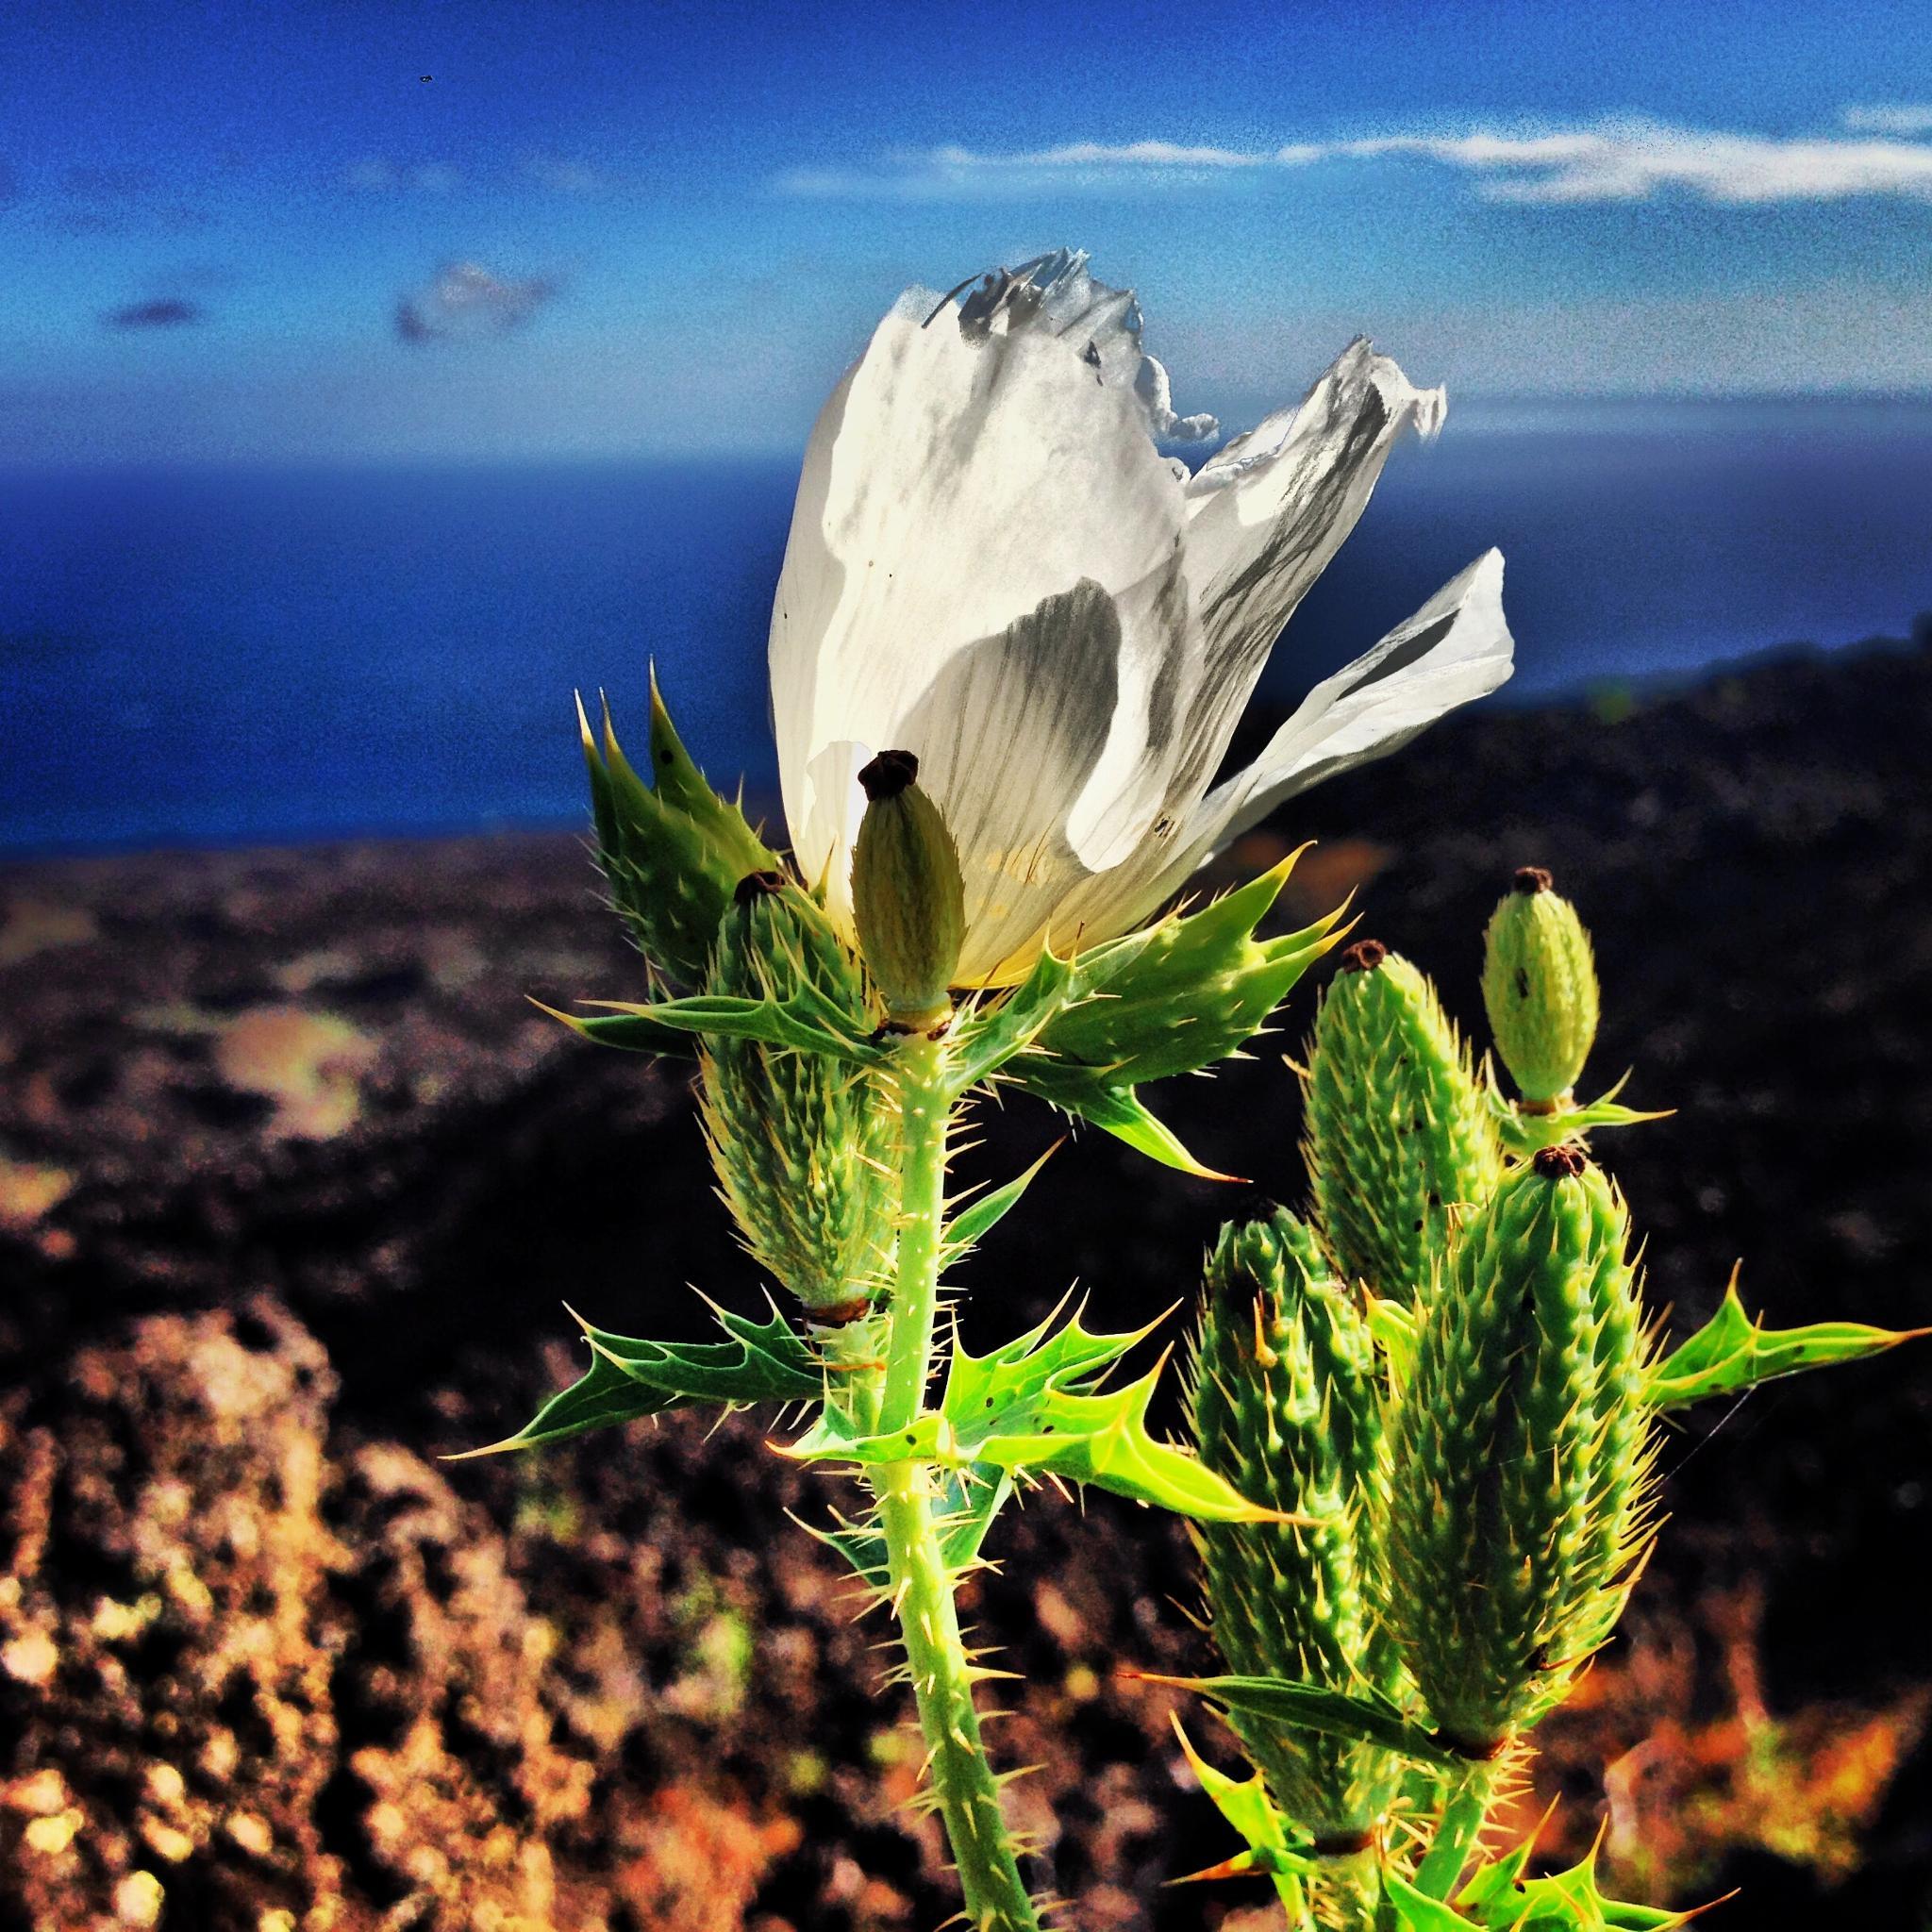 Maui Poppy by alana.cini